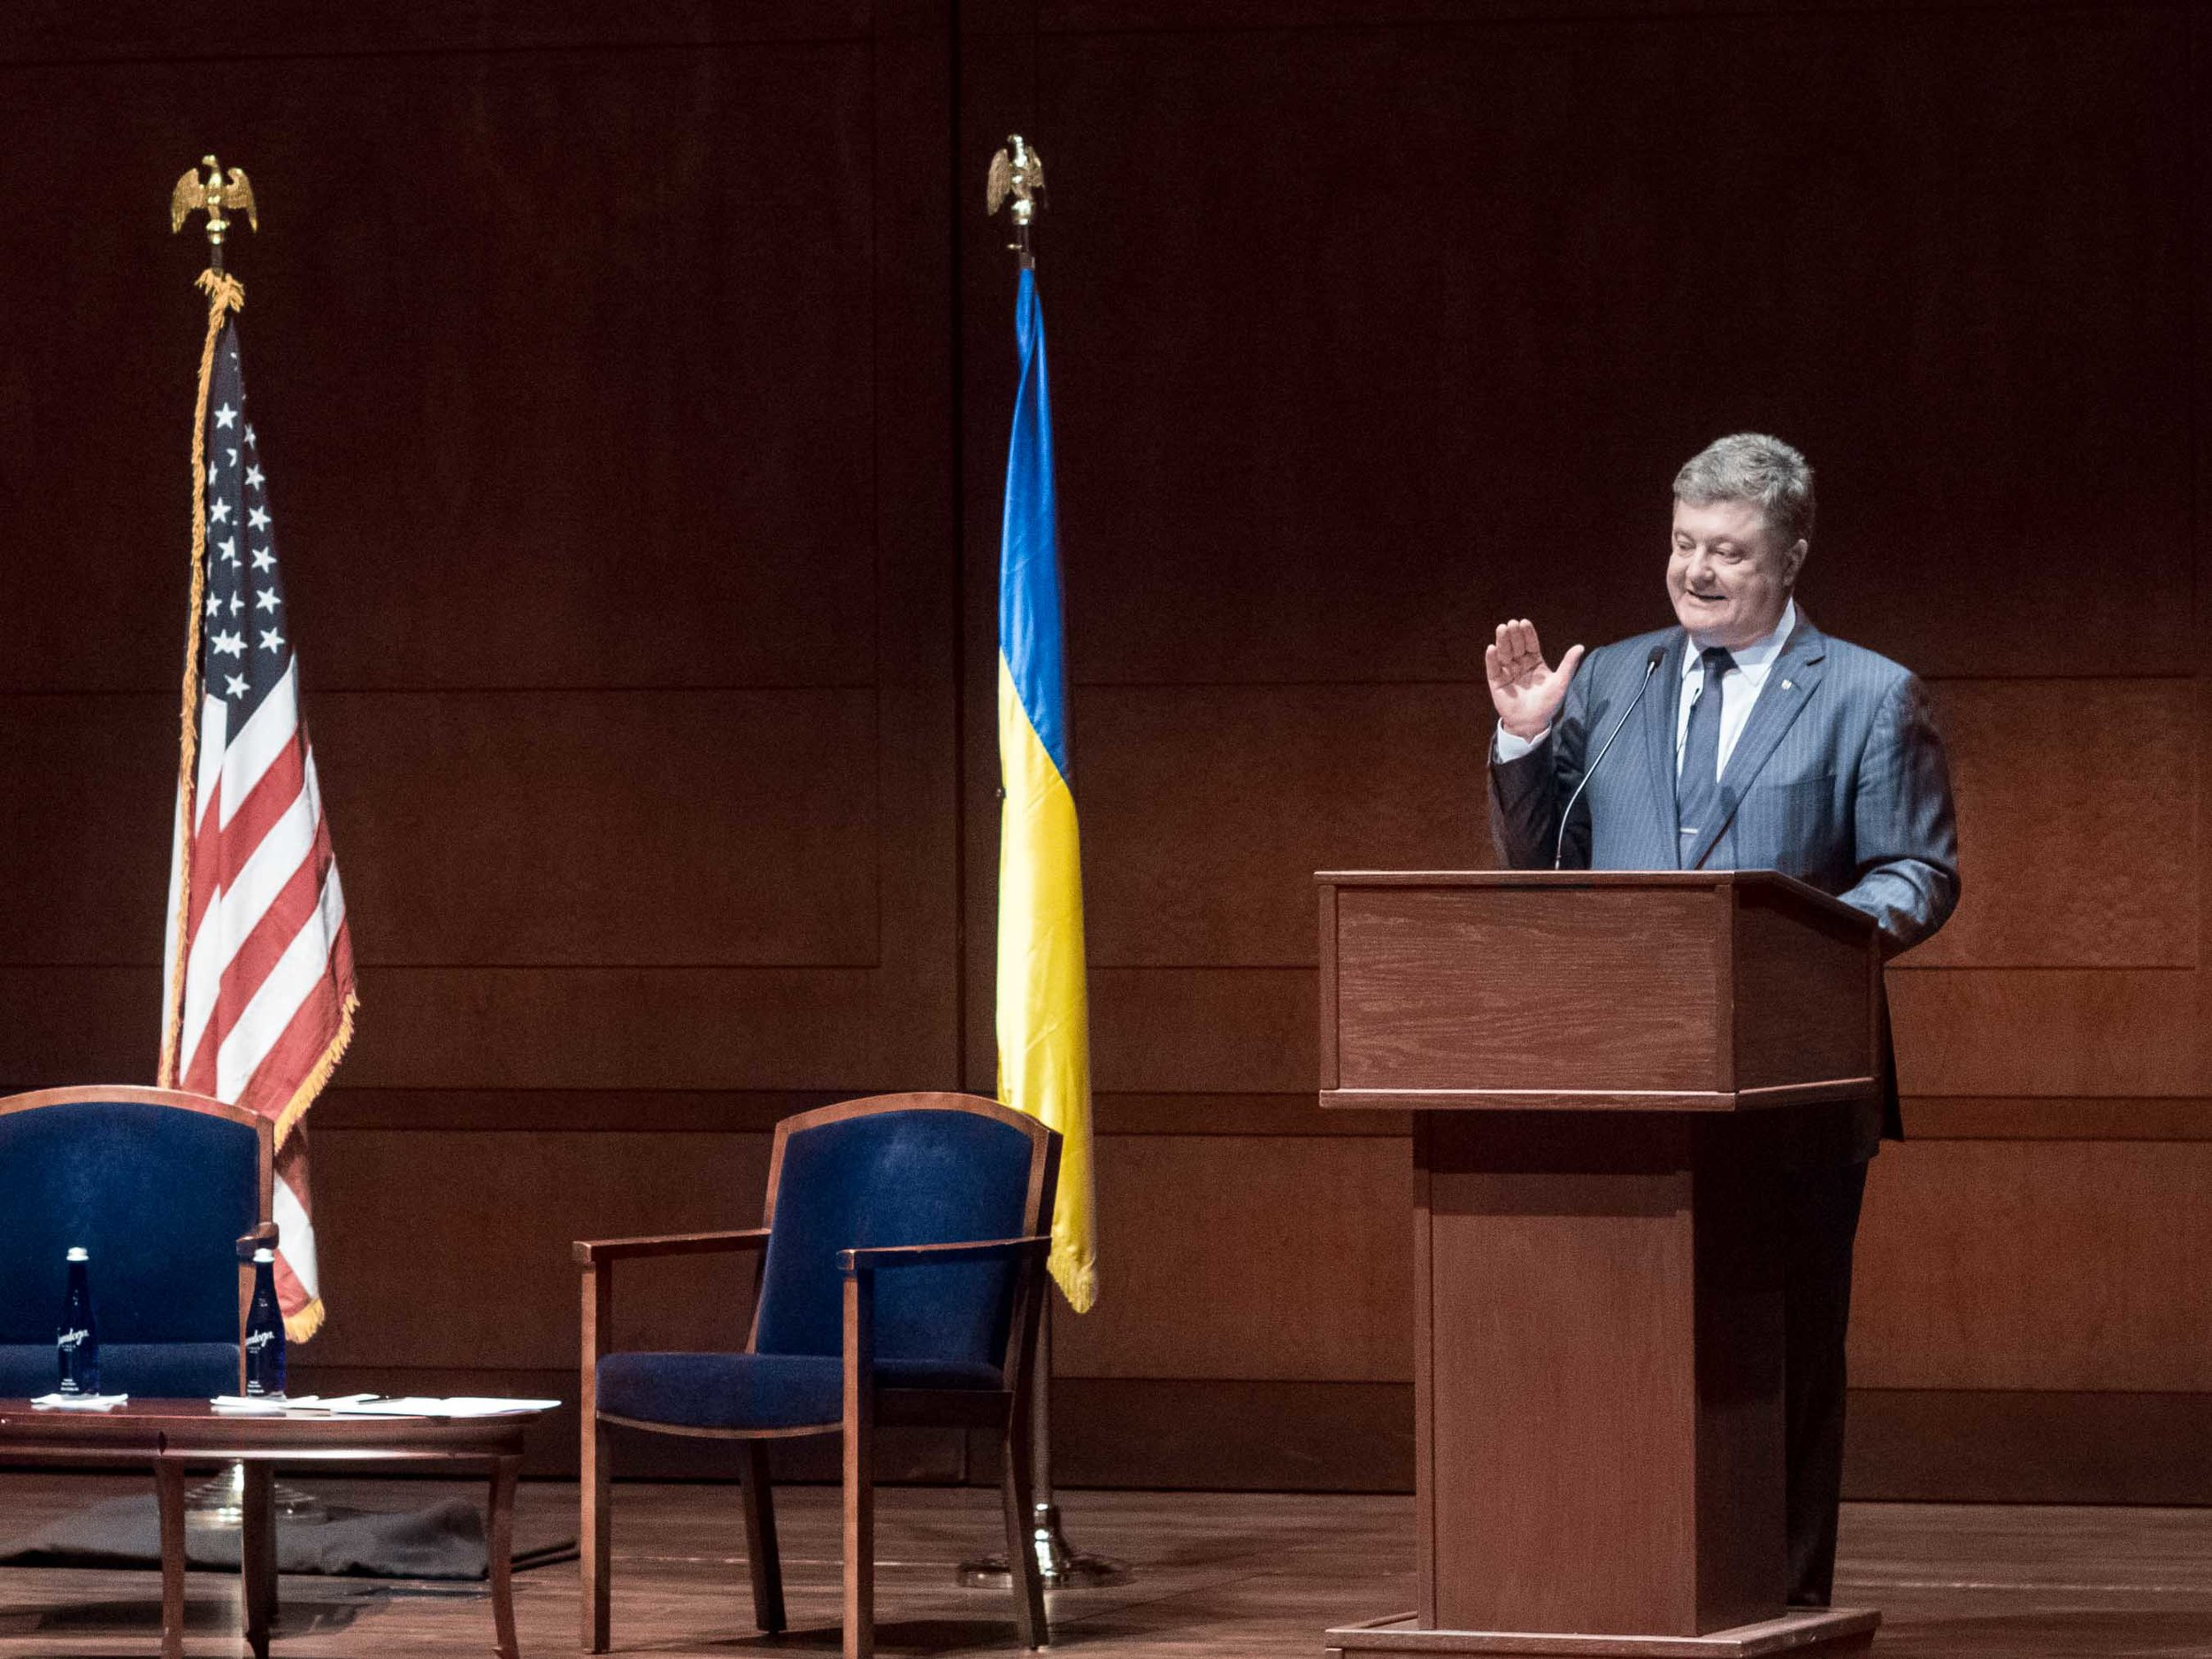 poroshenko+zelensky+ukraine+event+photography+photographer+washington+dc+vadym+guliuk+president-2.jpg